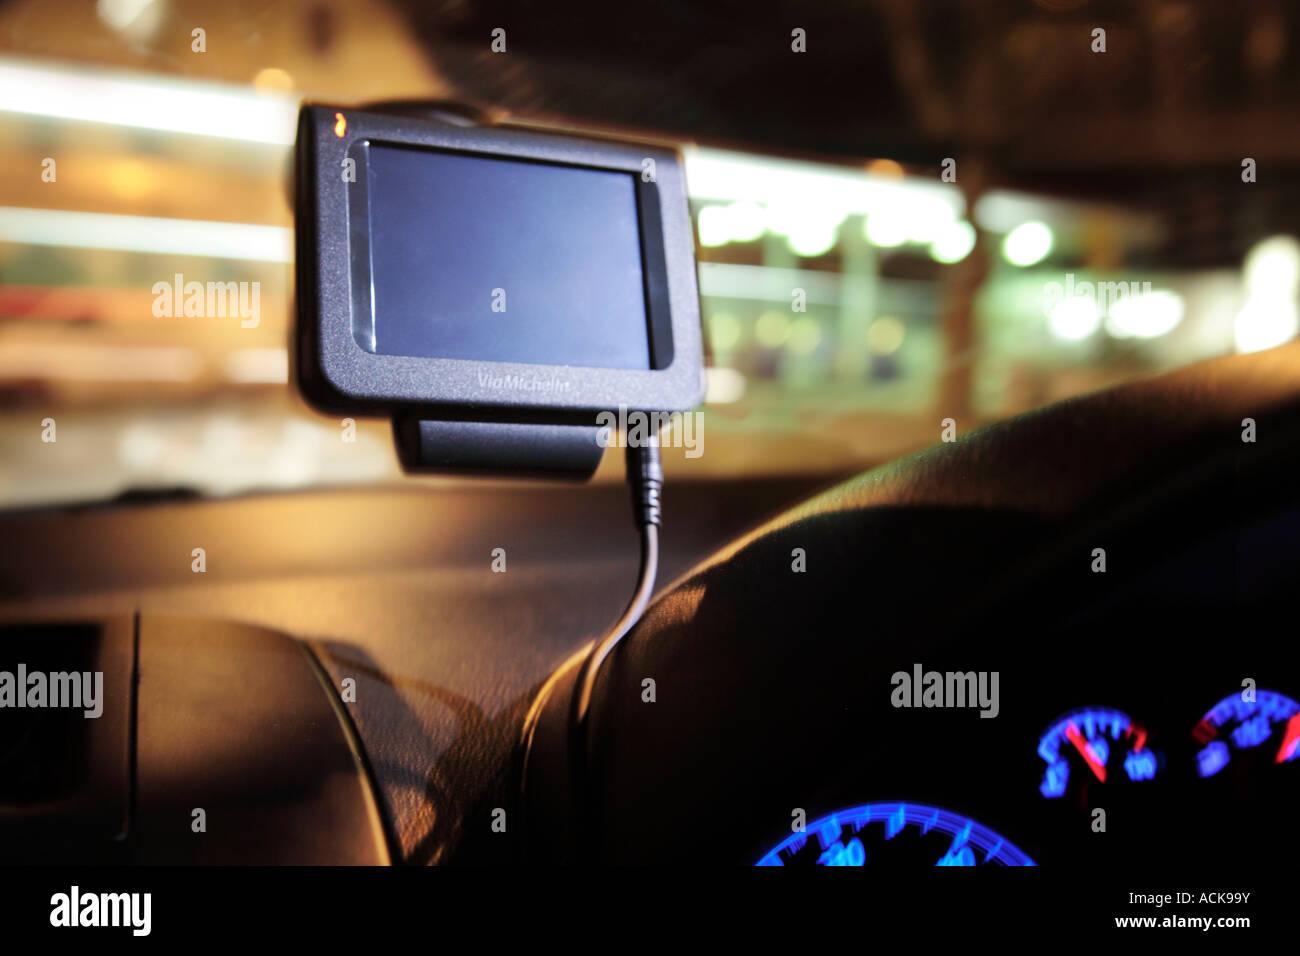 sat nav unit in a car at night. - Stock Image